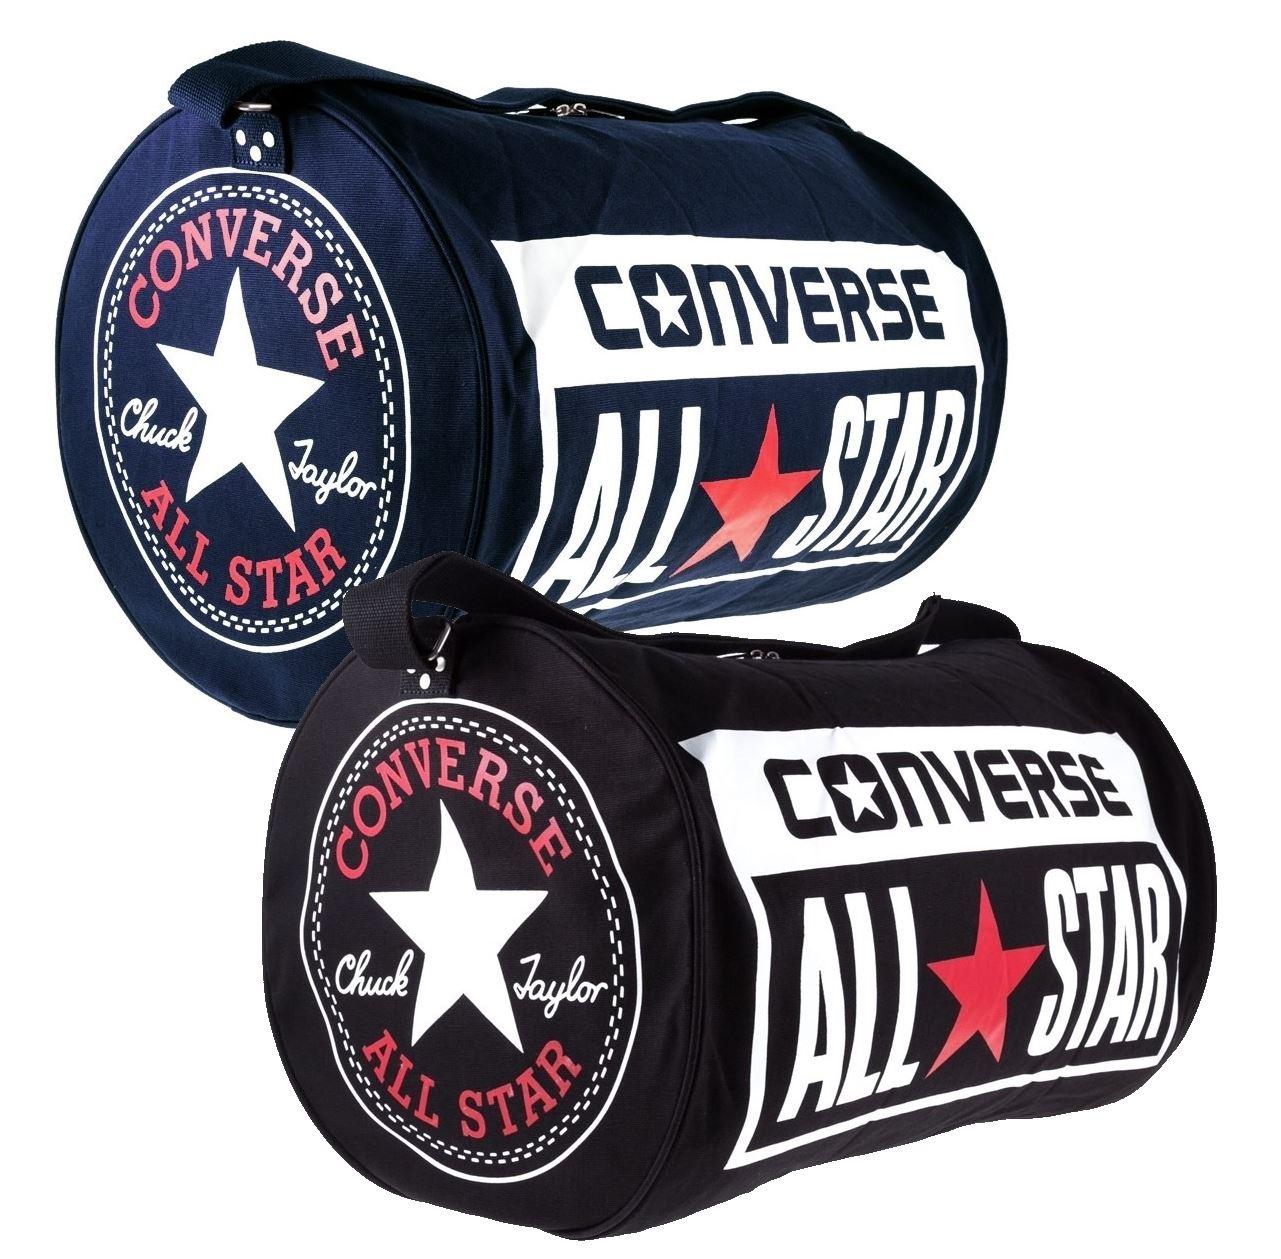 sac de sport converse all star